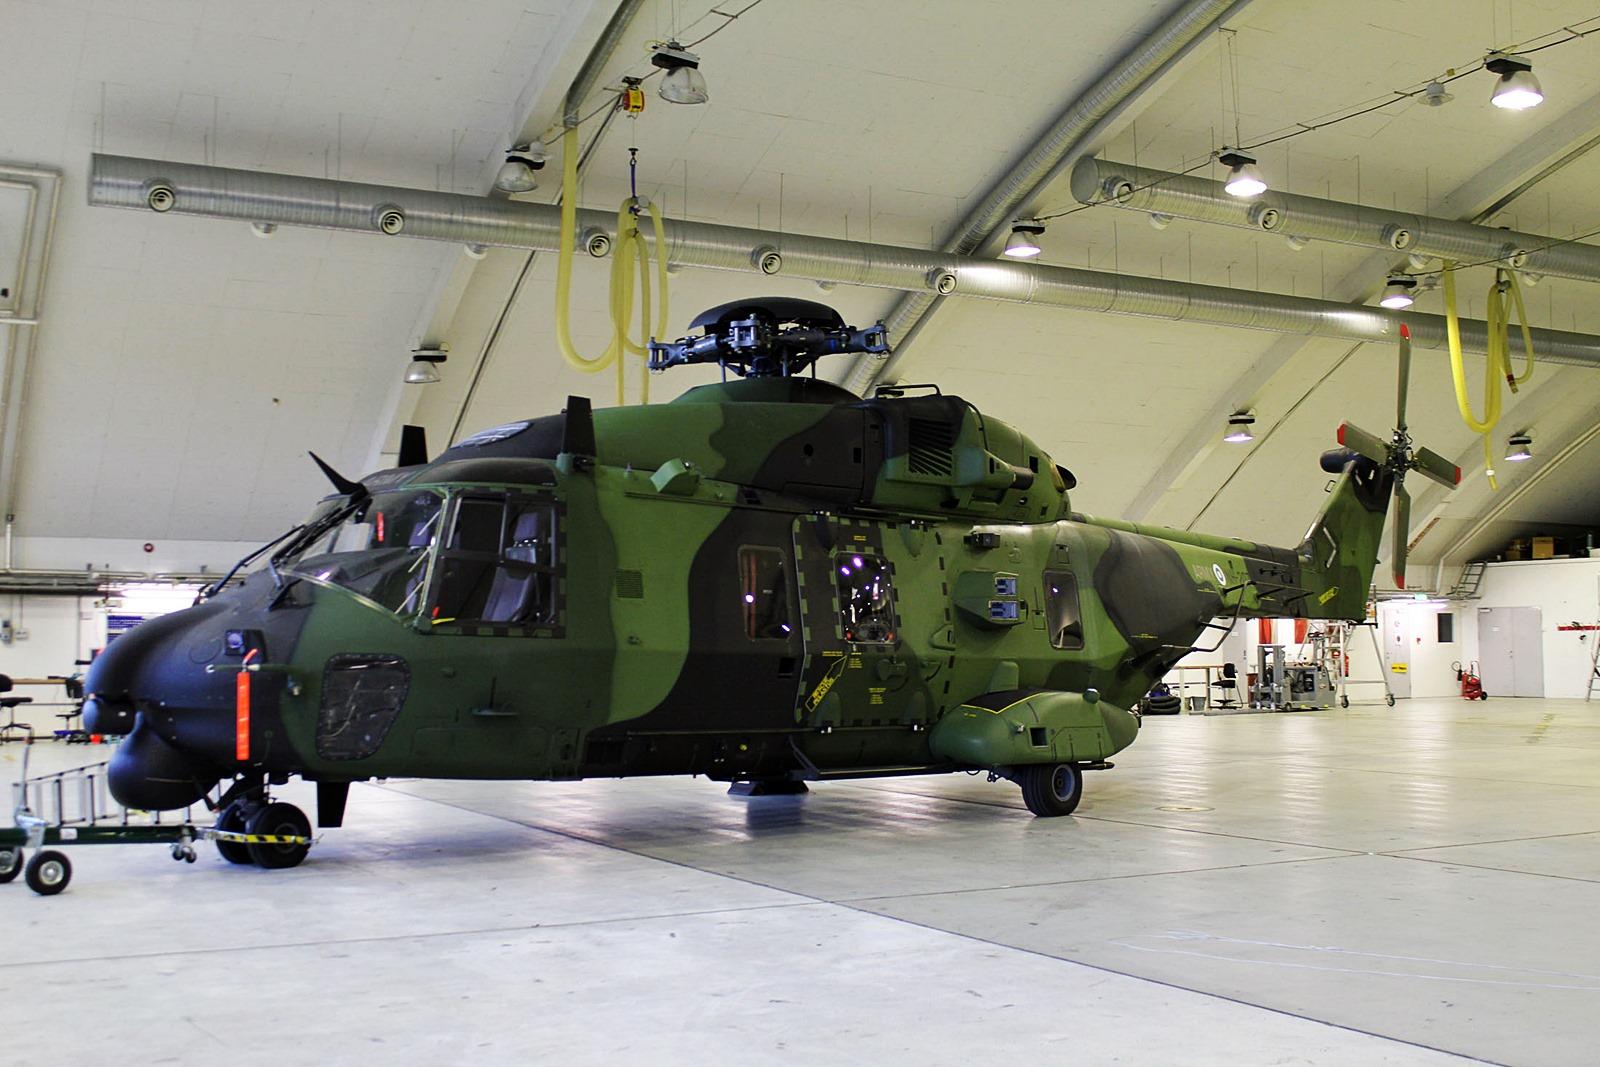 Iceland Air Meet 2014 위해 도착한 핀란드공군 NH-90